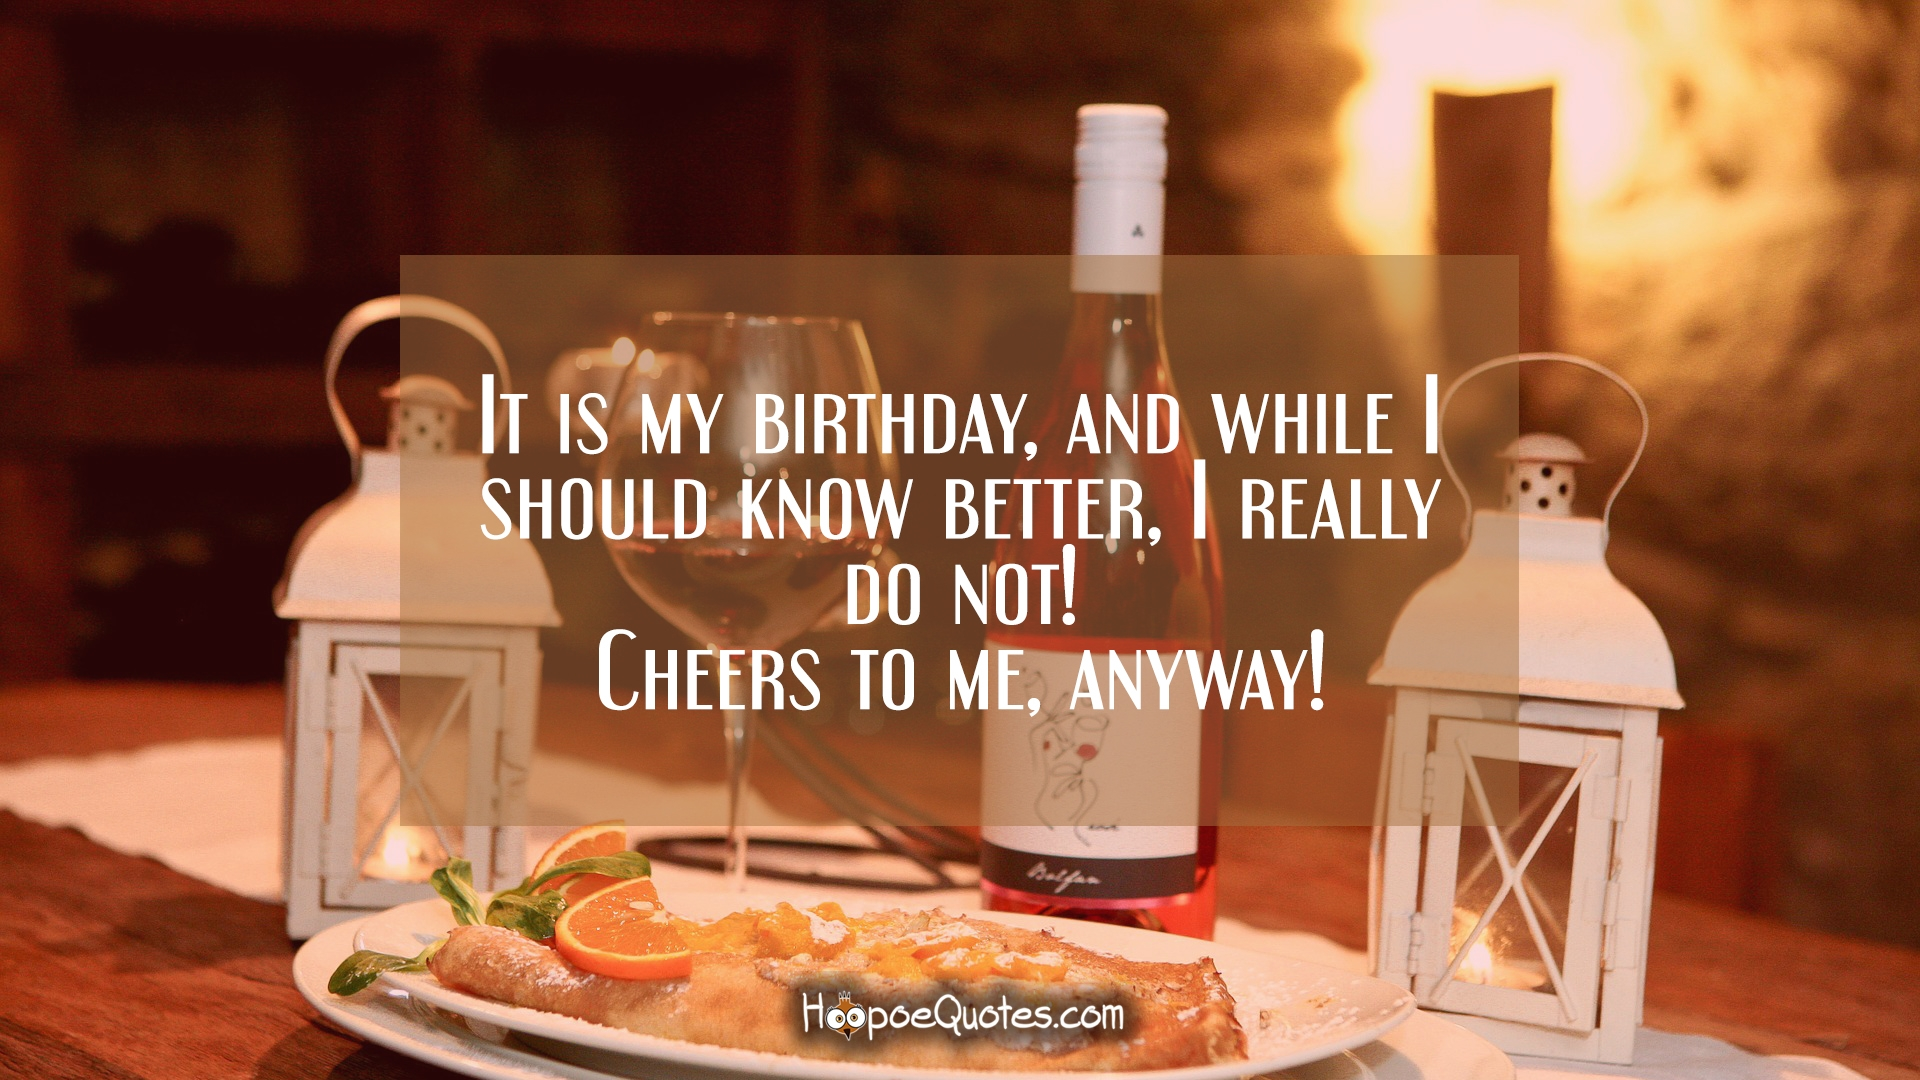 Fullsize Of What Should I Do For My Birthday